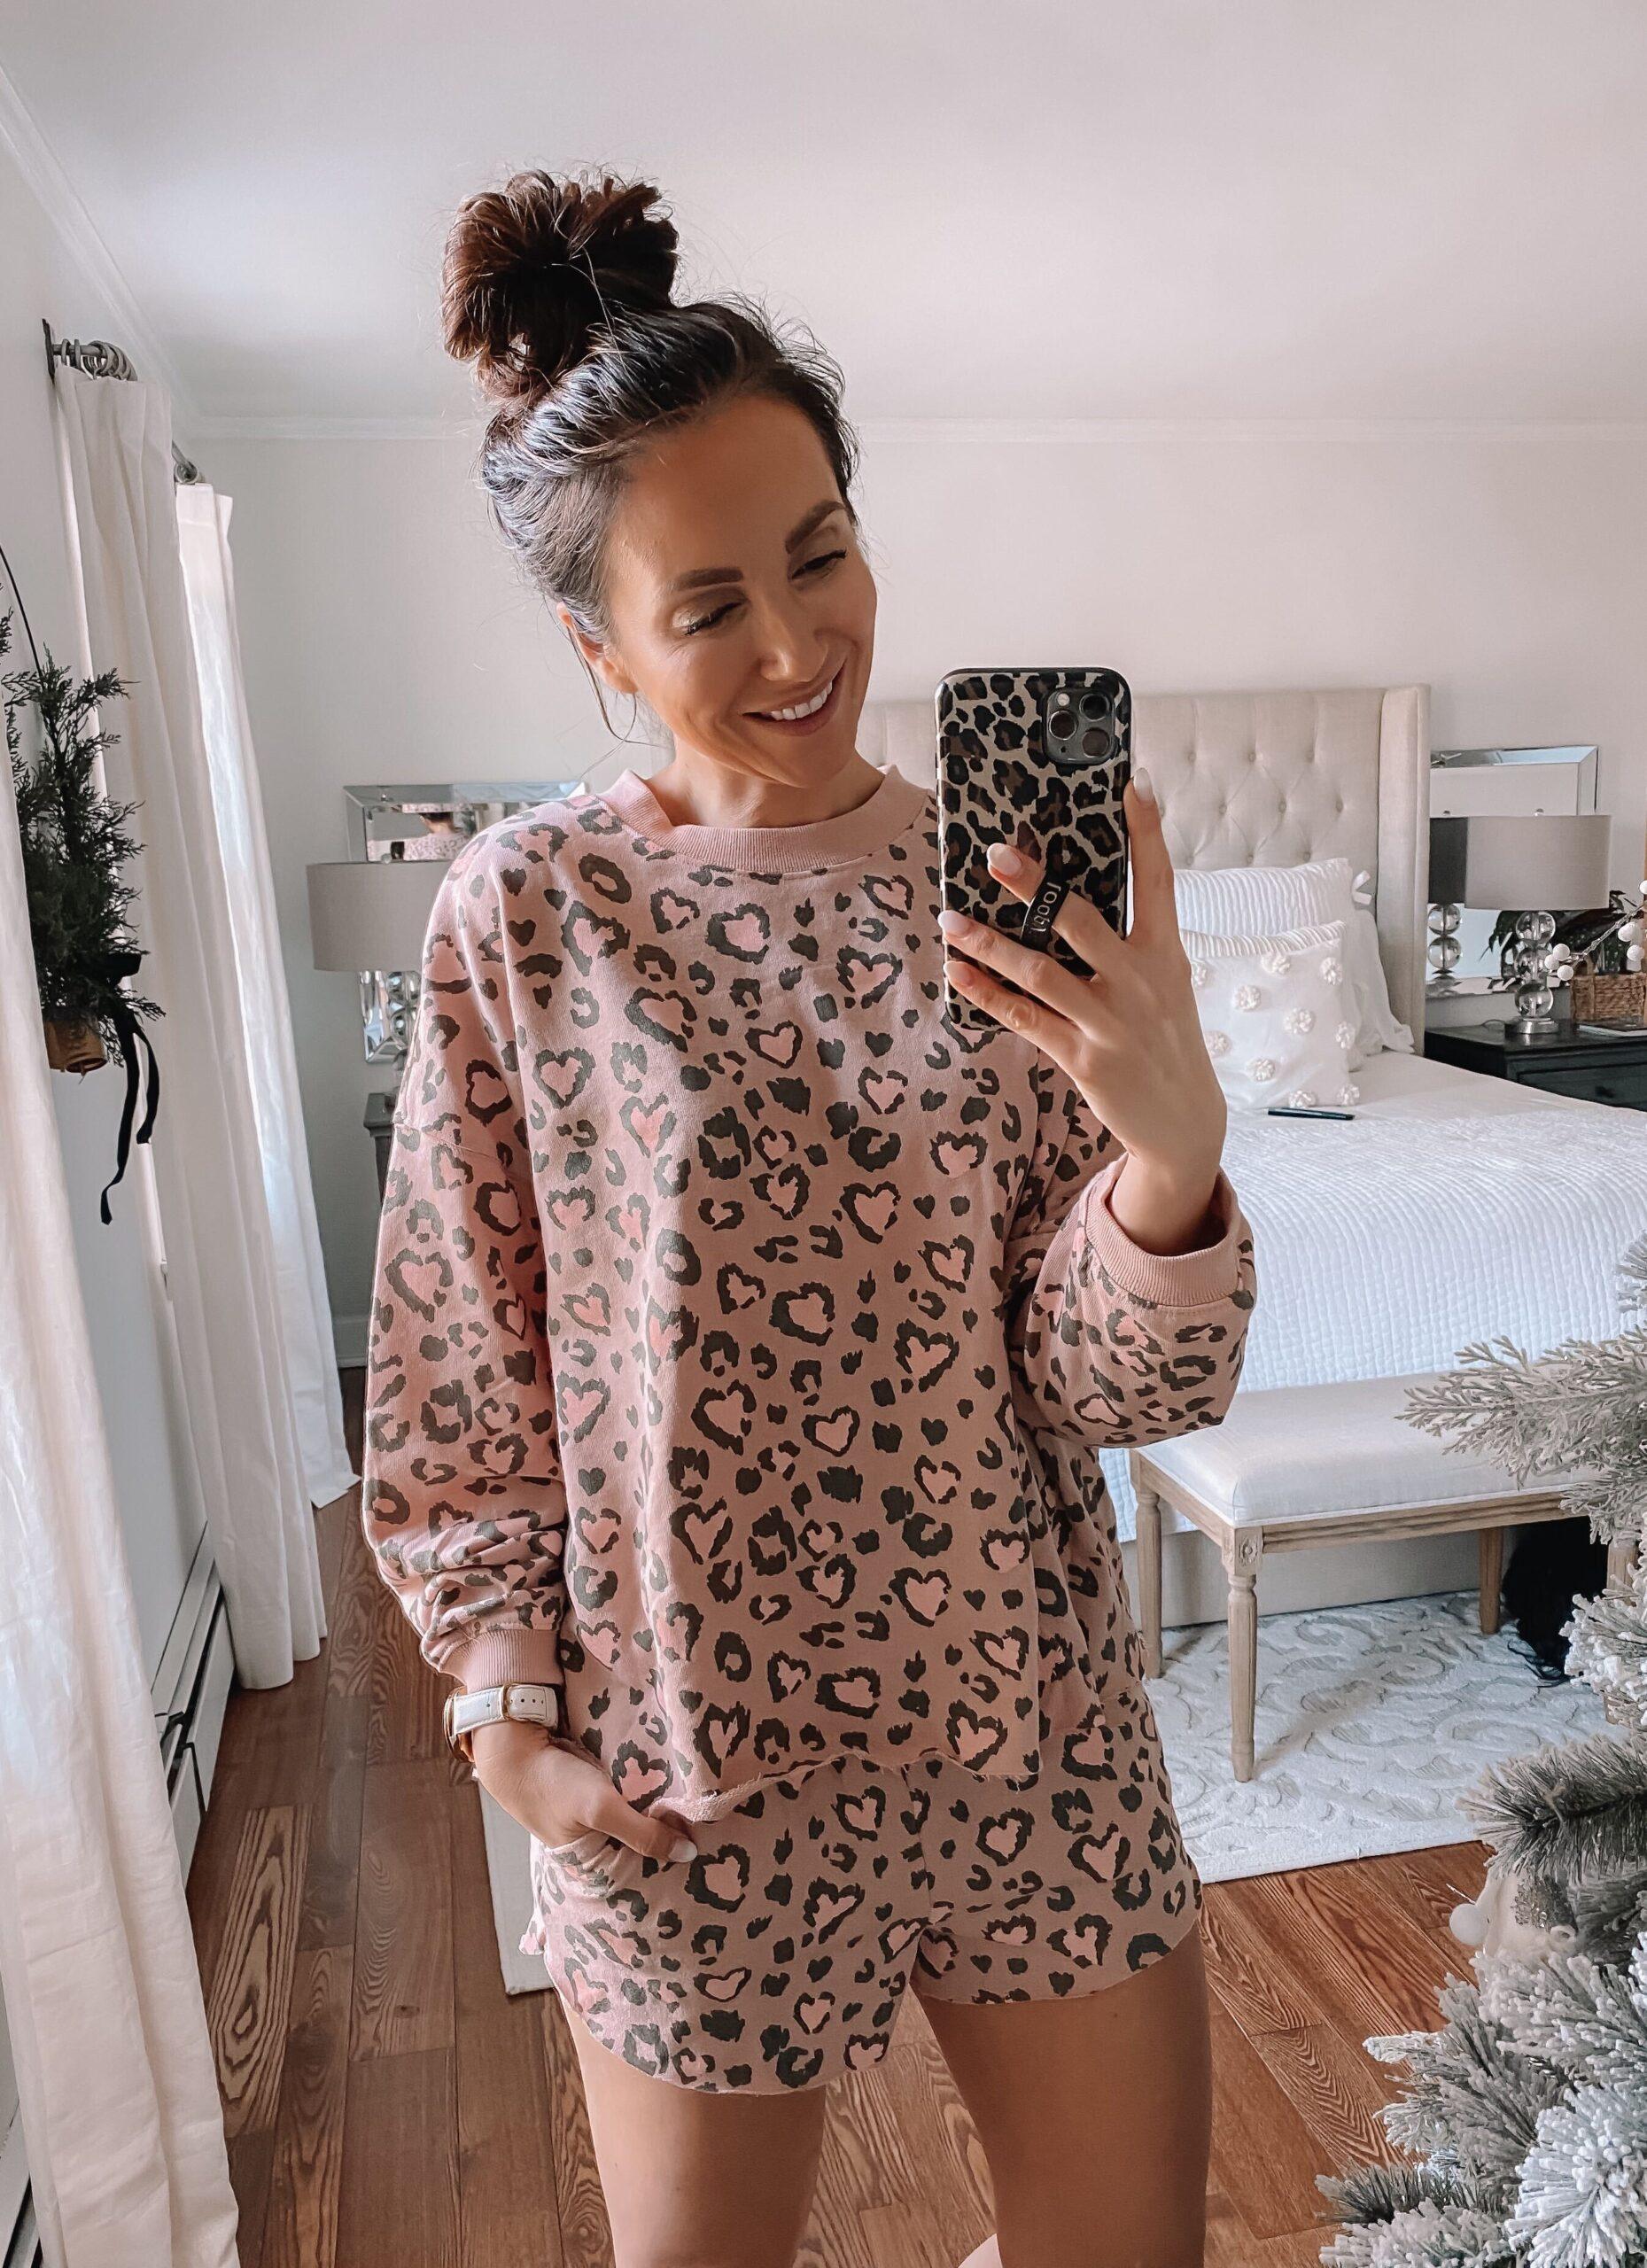 target style, target leopard pajamas